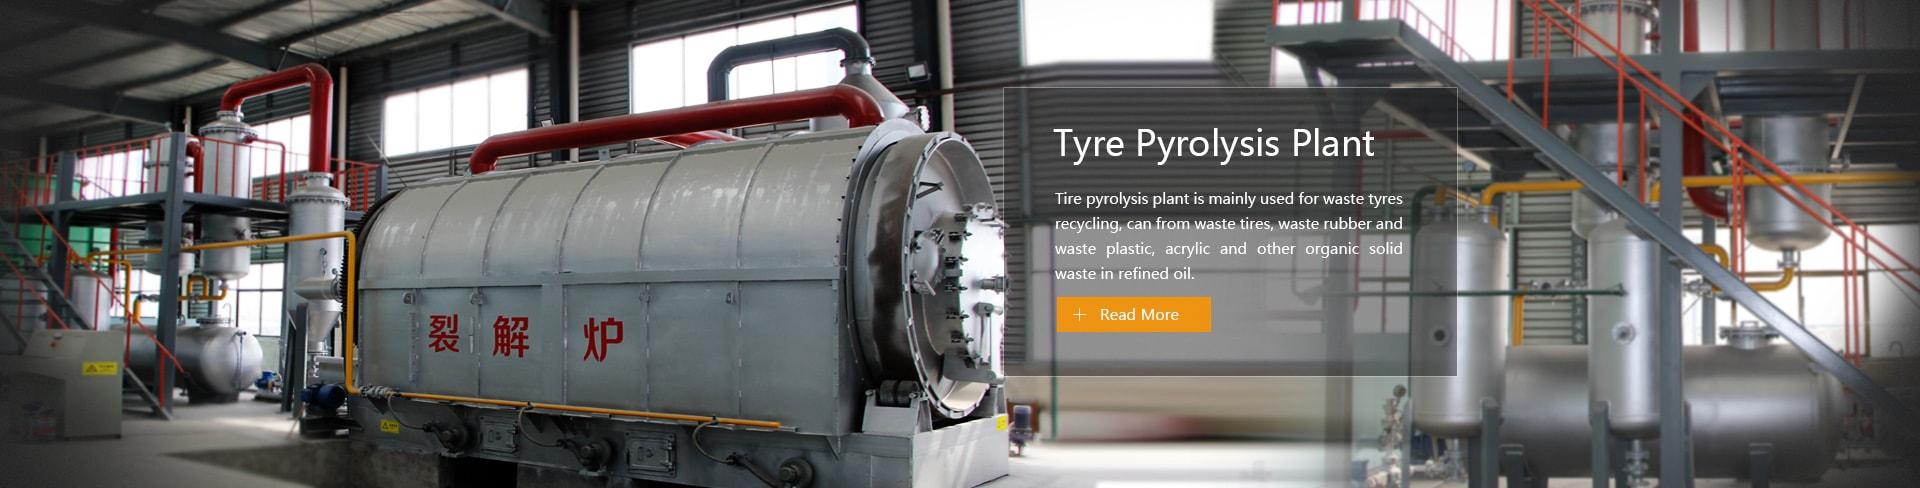 Tyre yrolysis Plant